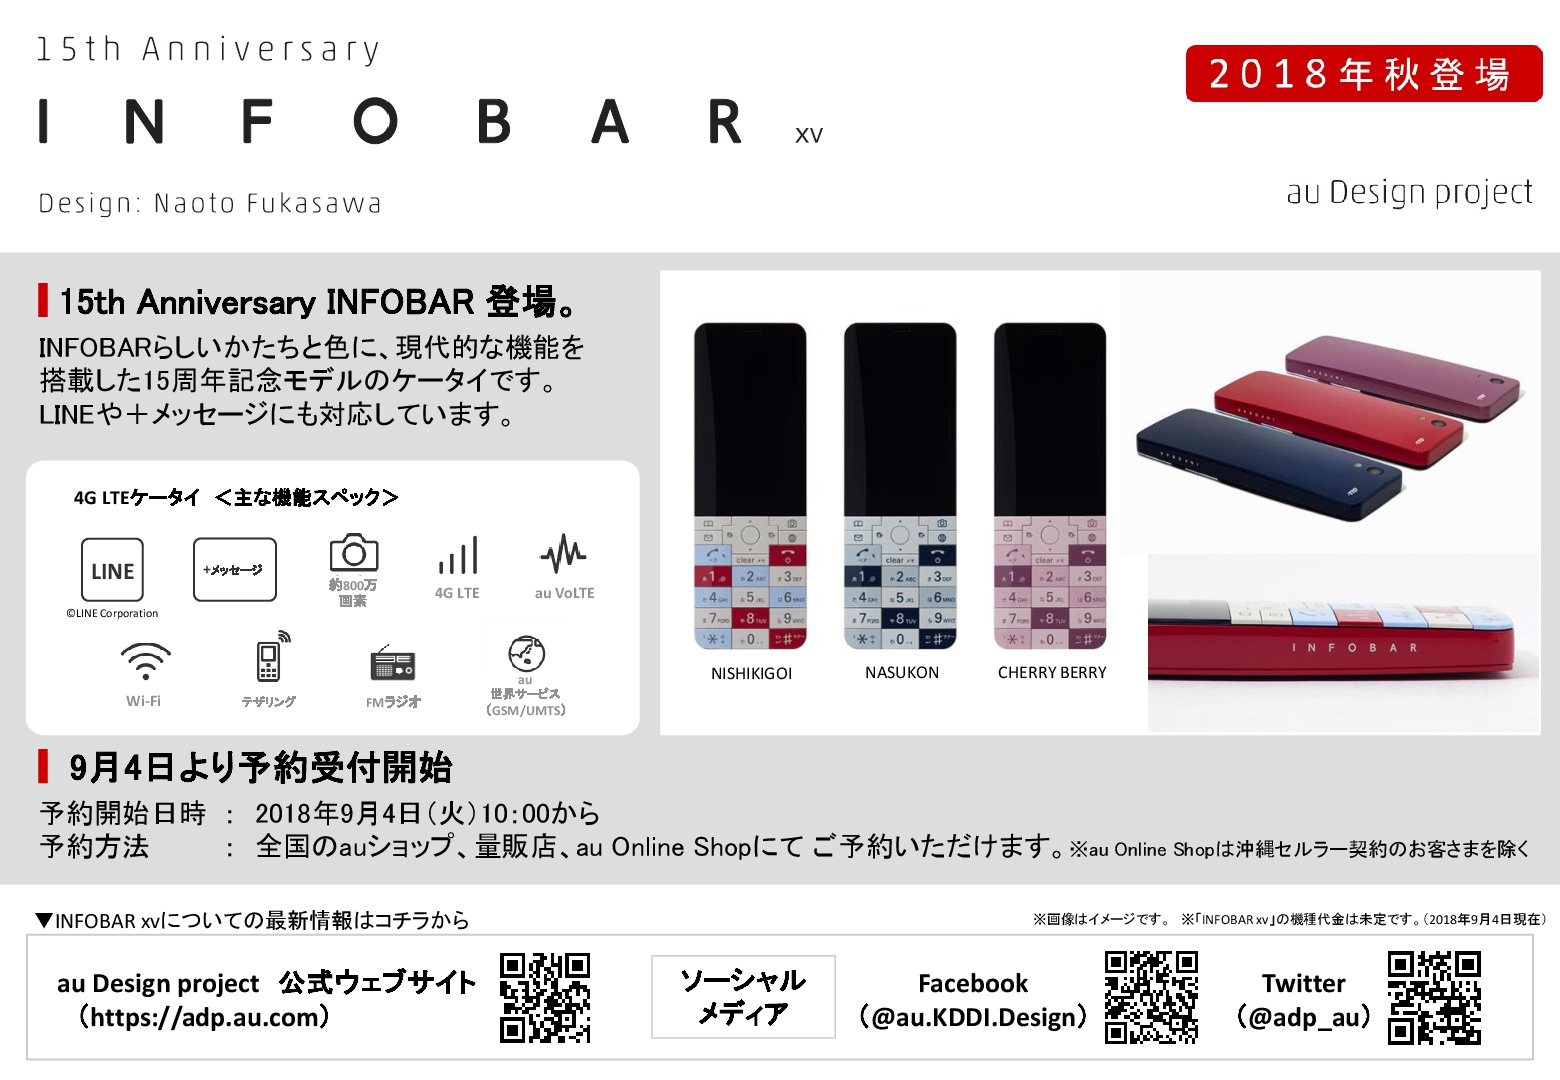 【A4チラシ】INFOBAR xv 9月4日予約受付開始-001